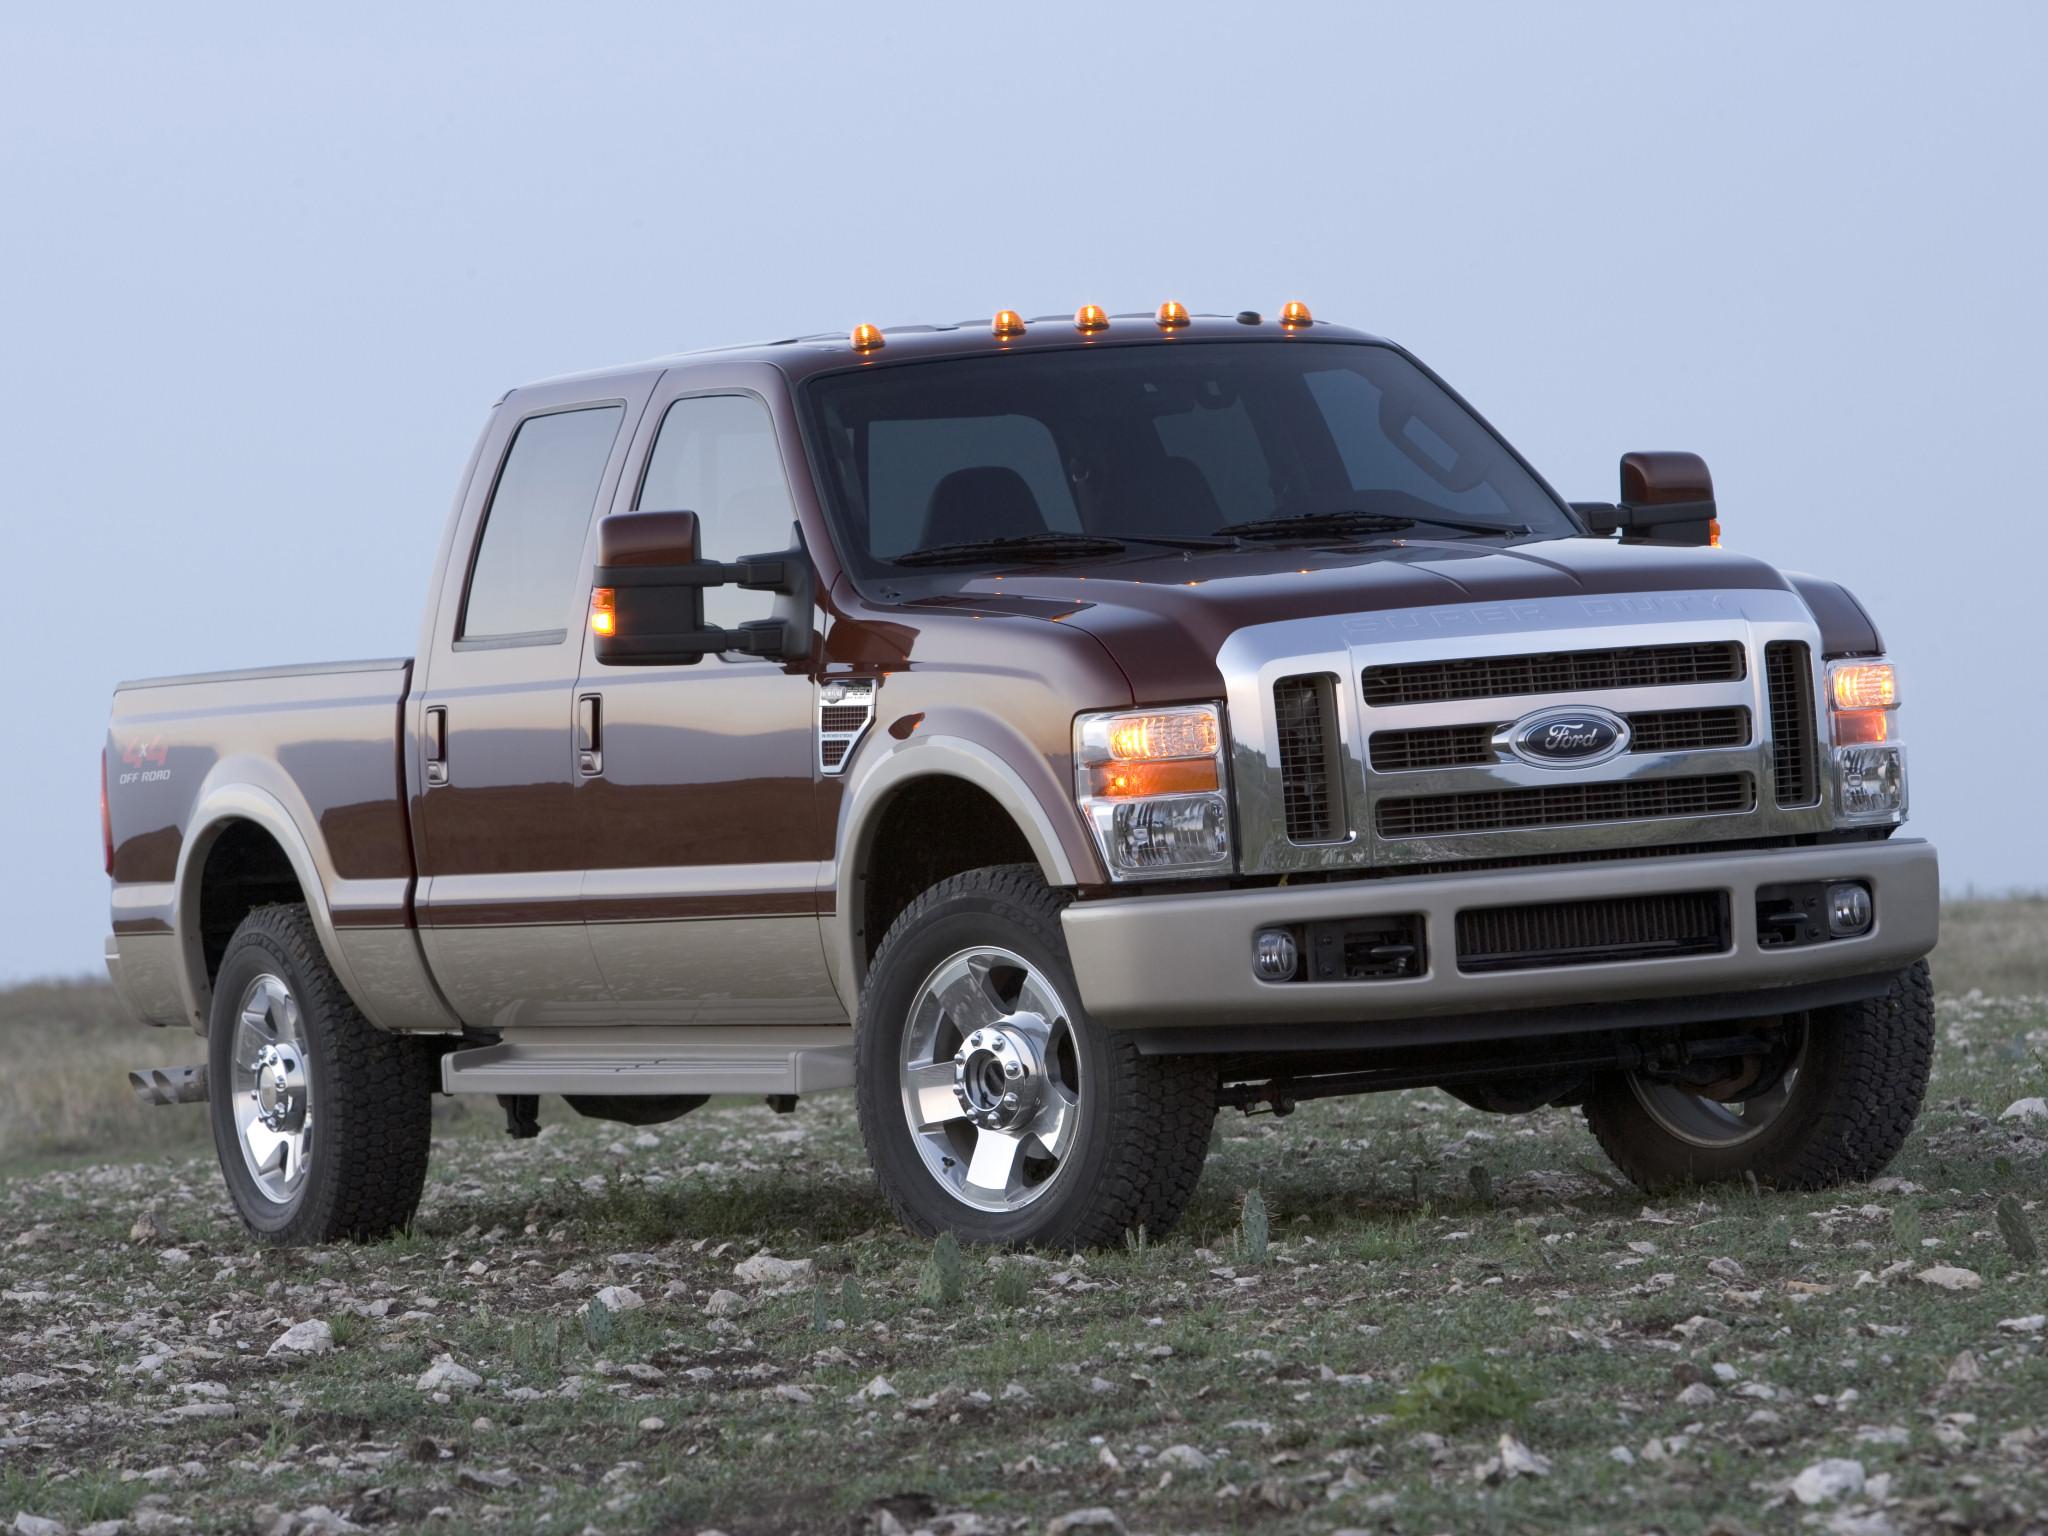 2008 Ford F 250 SuperDuty truck 4x4 wallpaper background 2048x1536